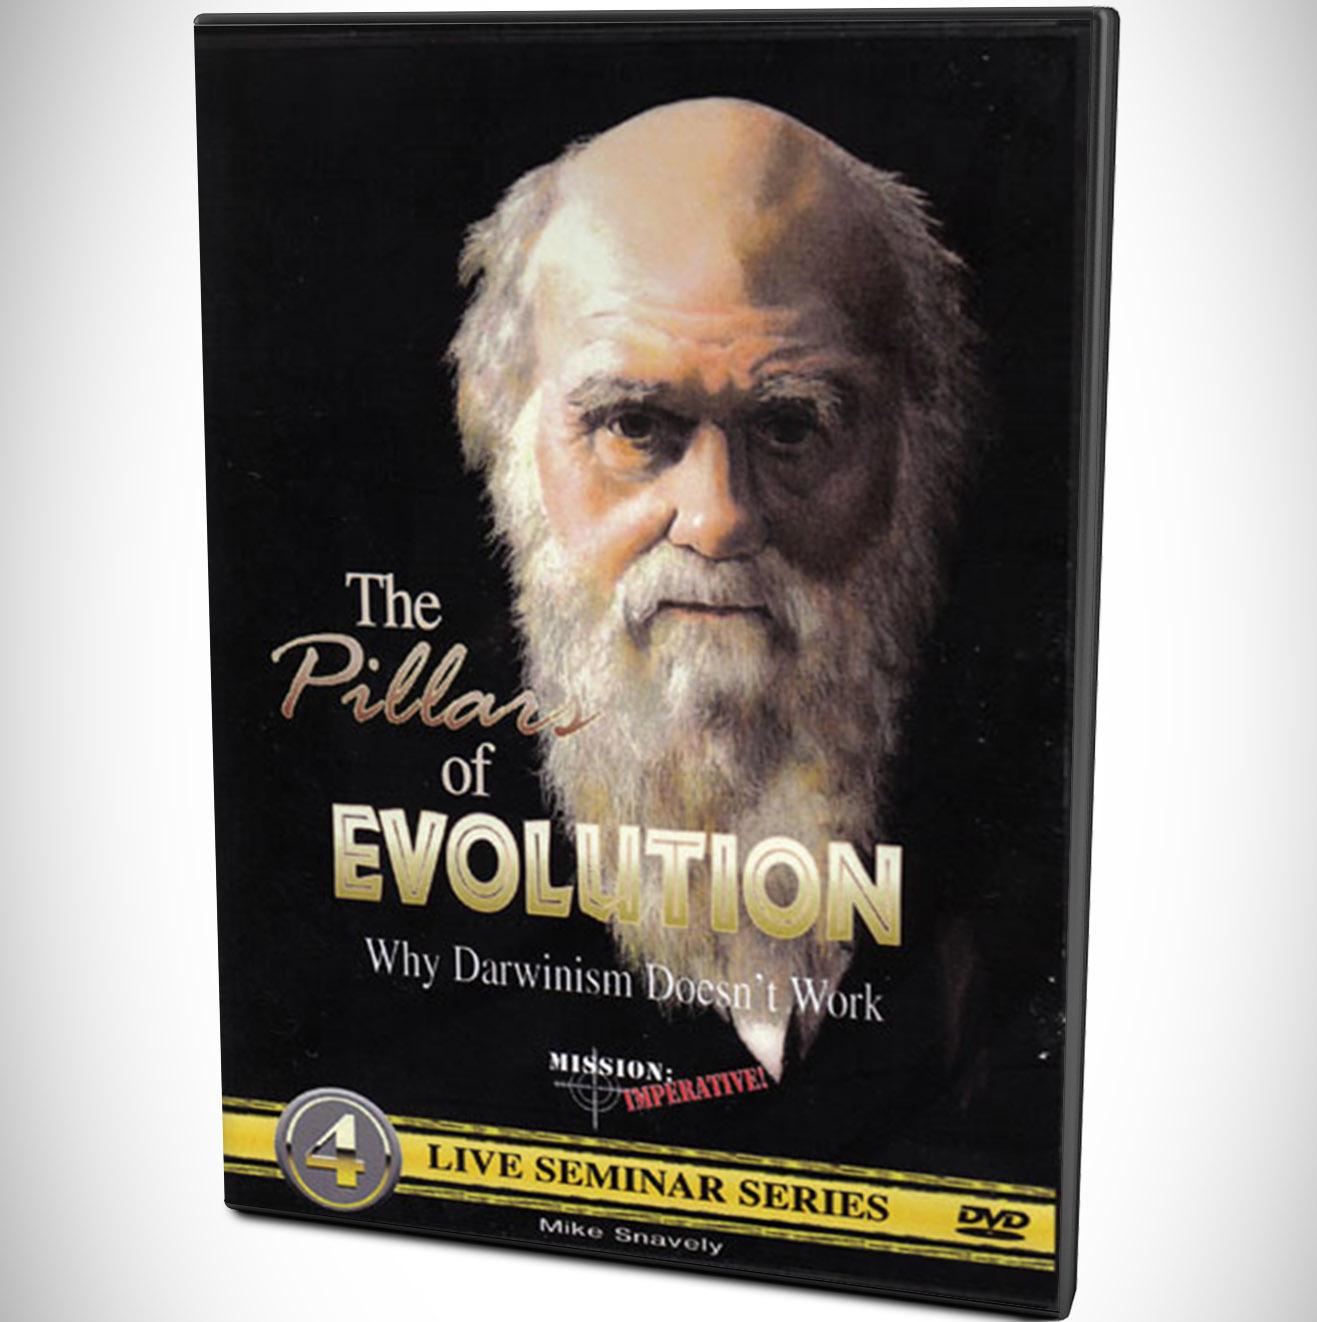 The Pillars of Evolution DVD